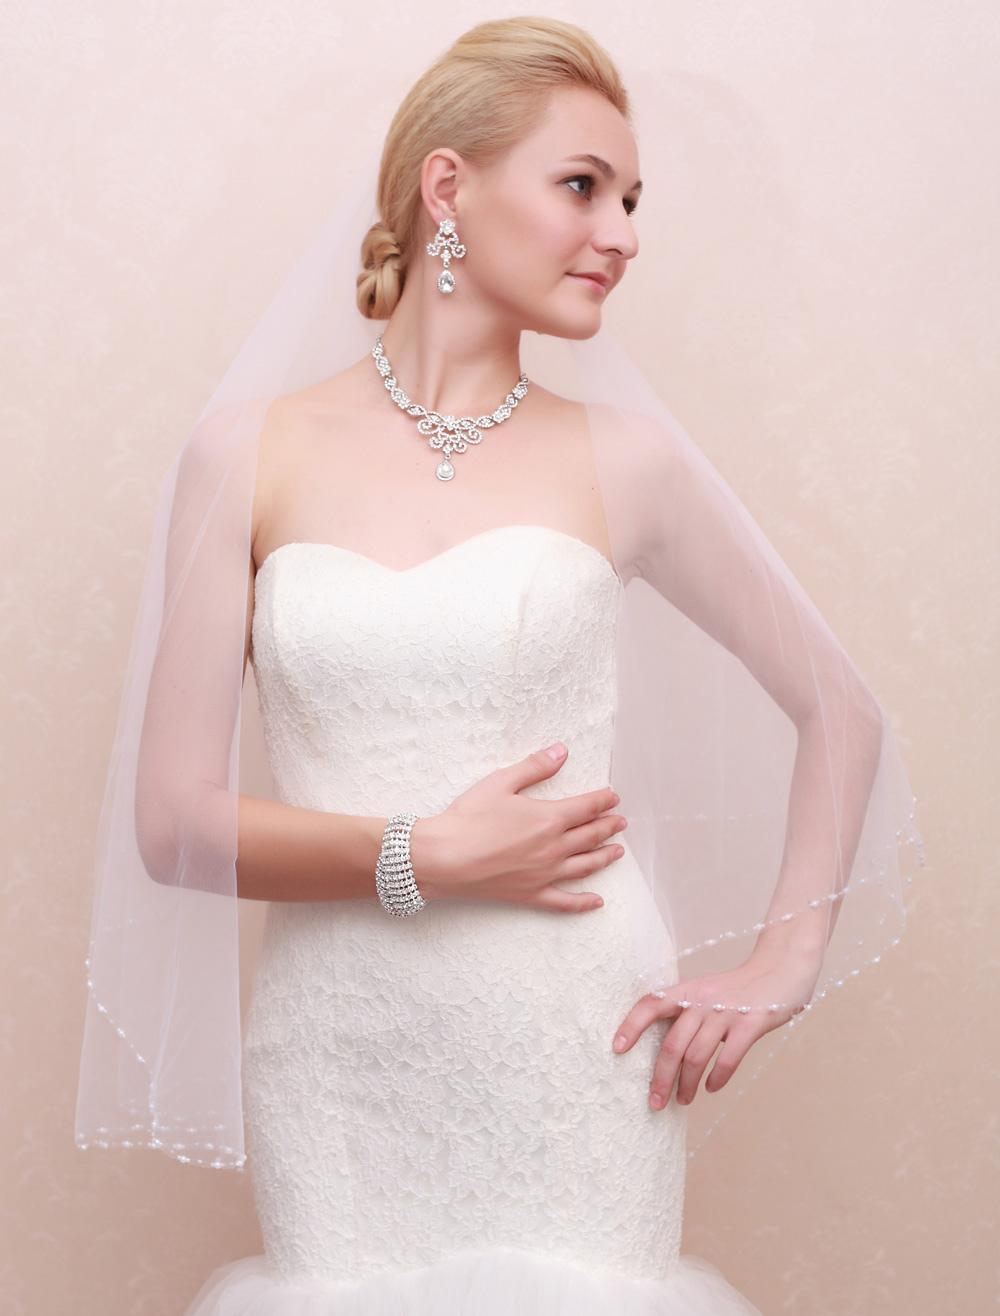 Wedding Veil Imitation Pearls Edge Fingertip Oval   One Tier bridal veil